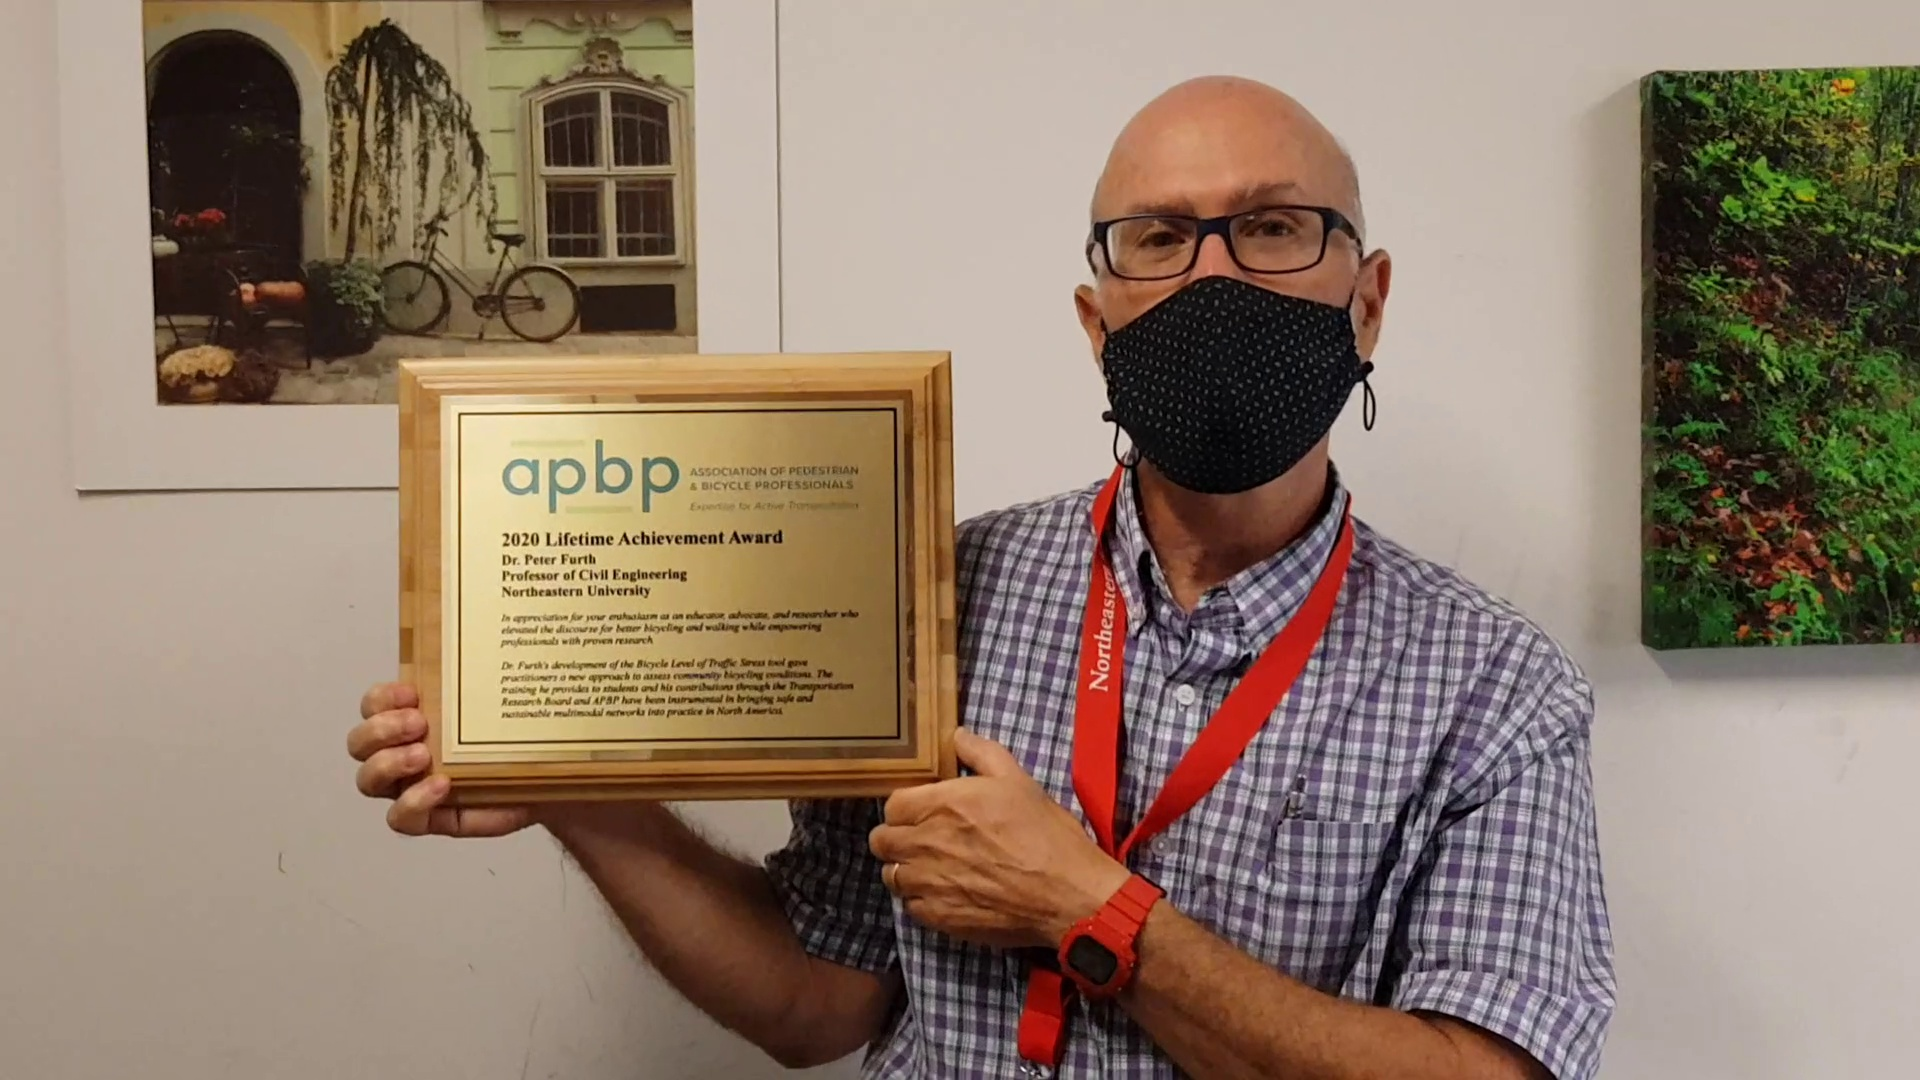 professor showing apbp award certificate